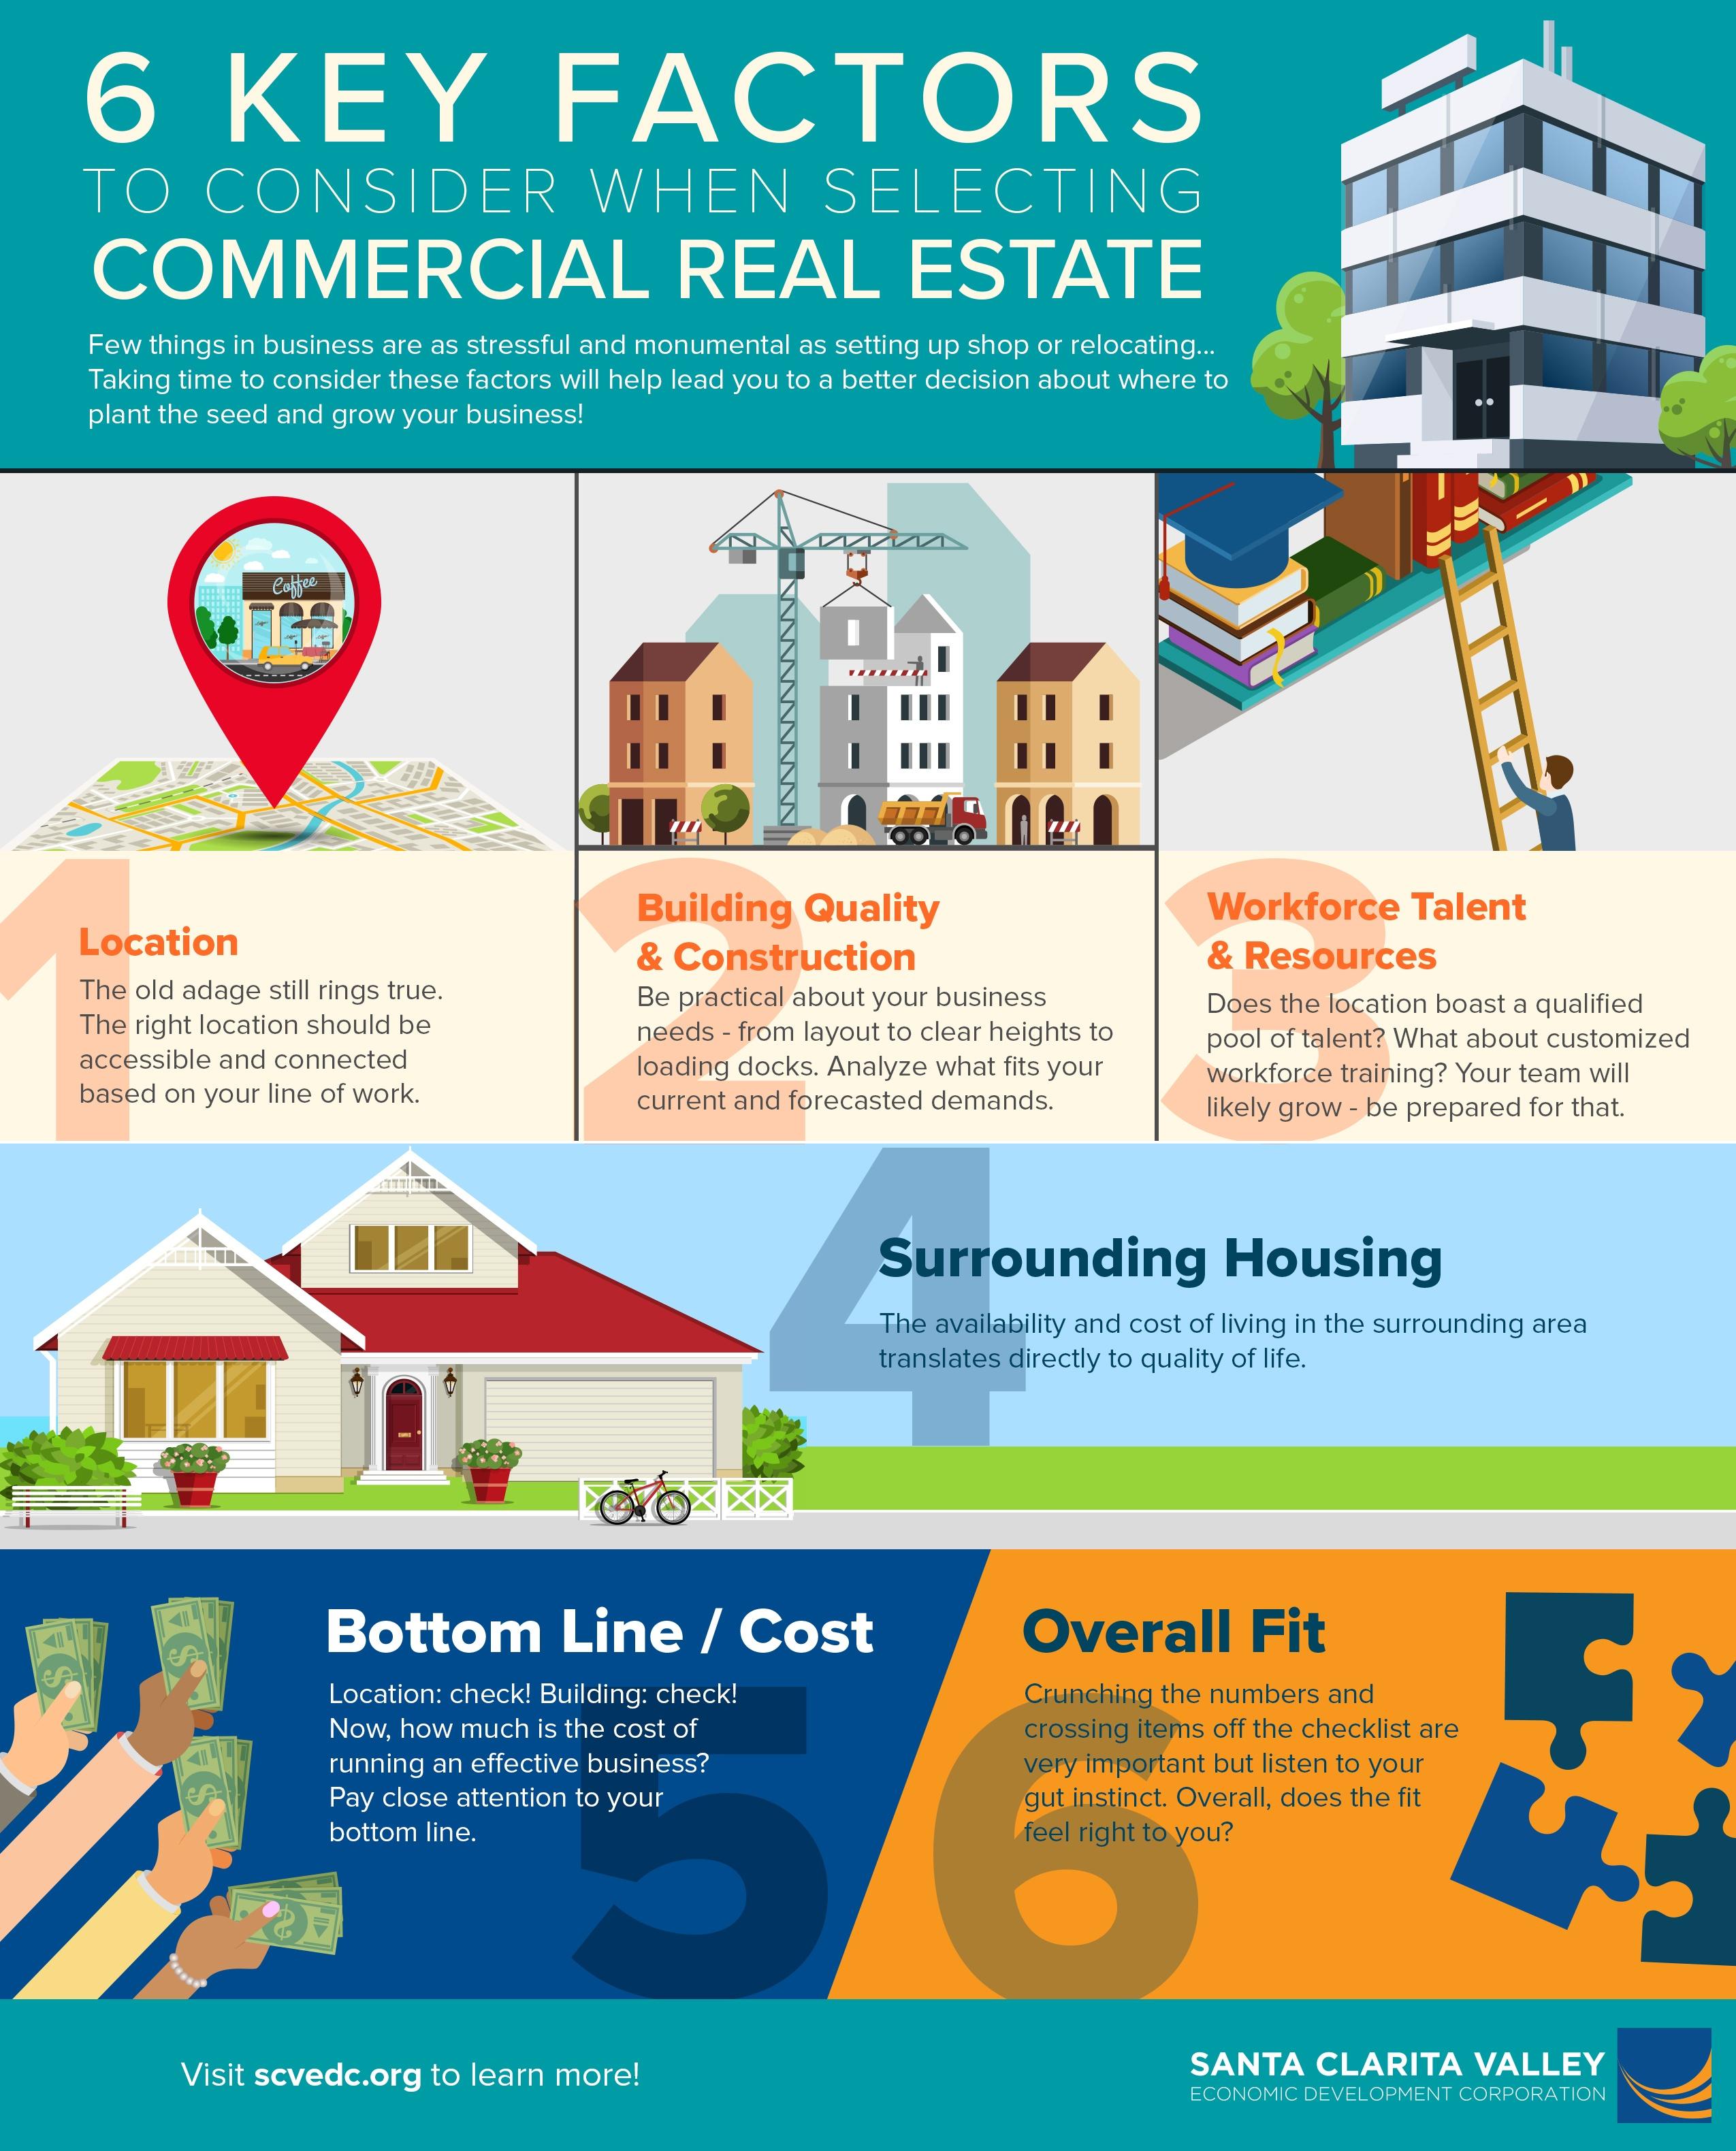 SCVEDC Infographic - 6 Key Factors Commercial Real Estate